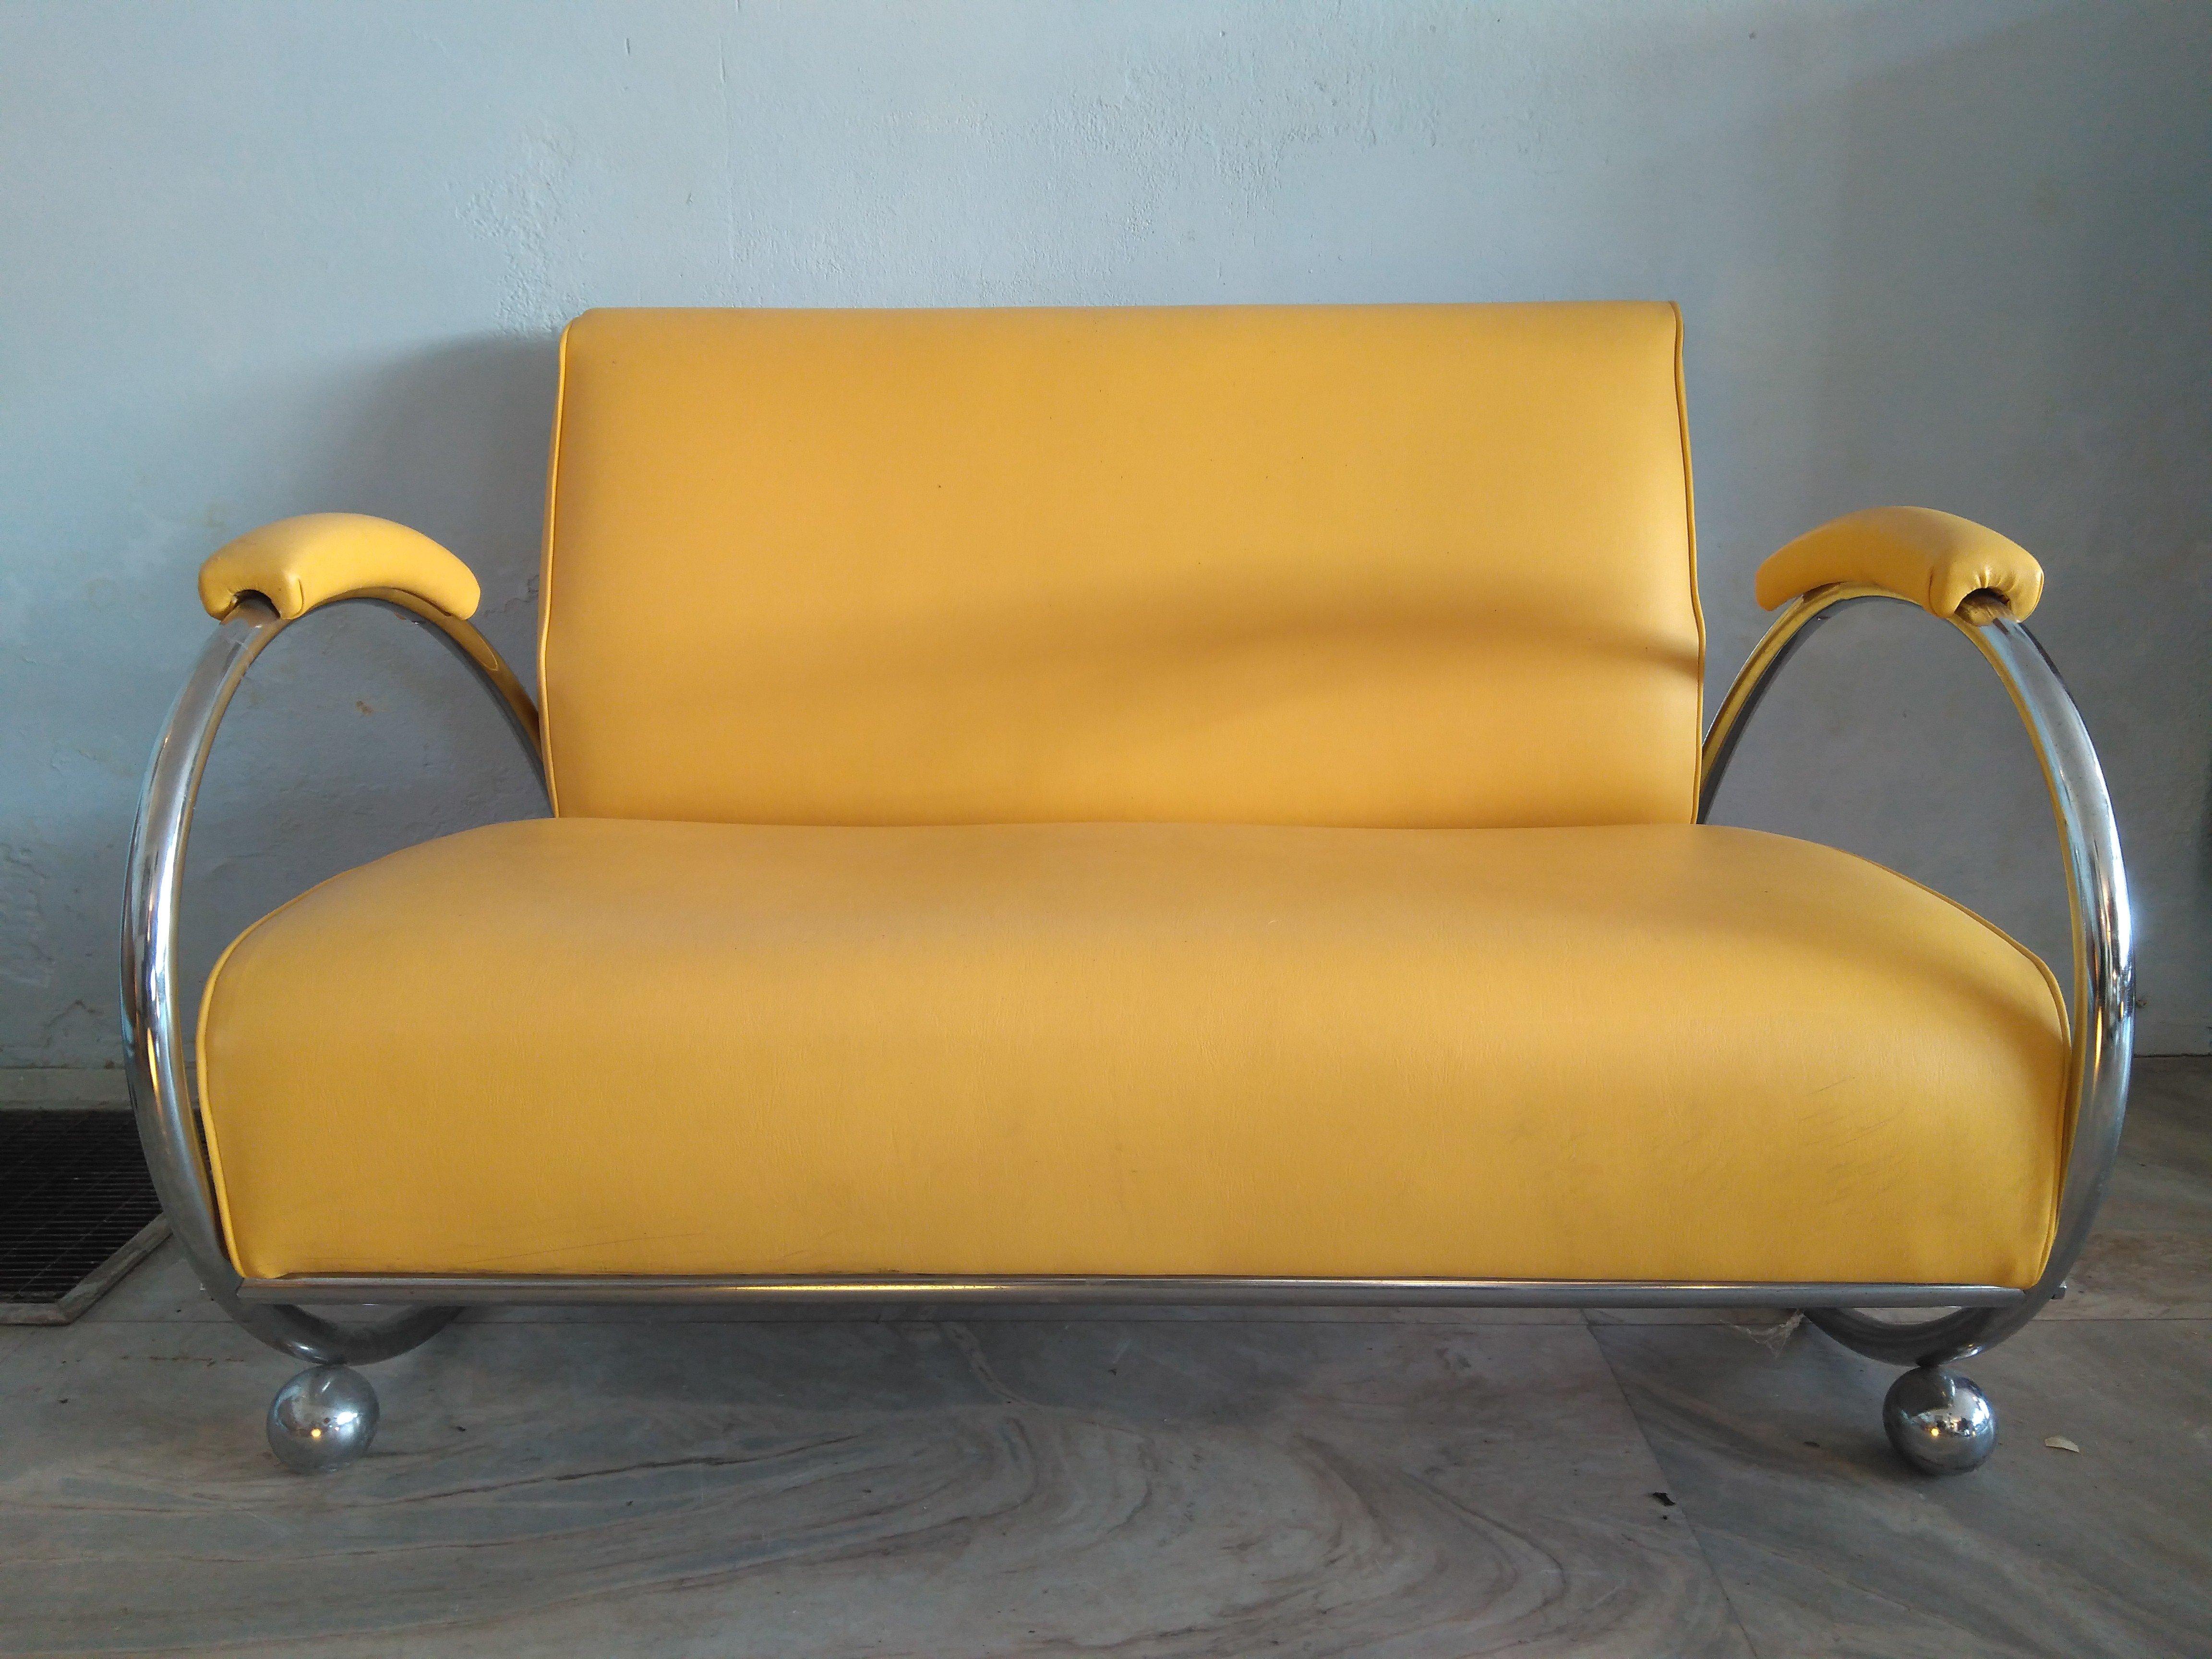 Pastoe Cees Braakman Bankje.El Vinta Sofa Two Seater Gispen Style Furniture Design Vintage